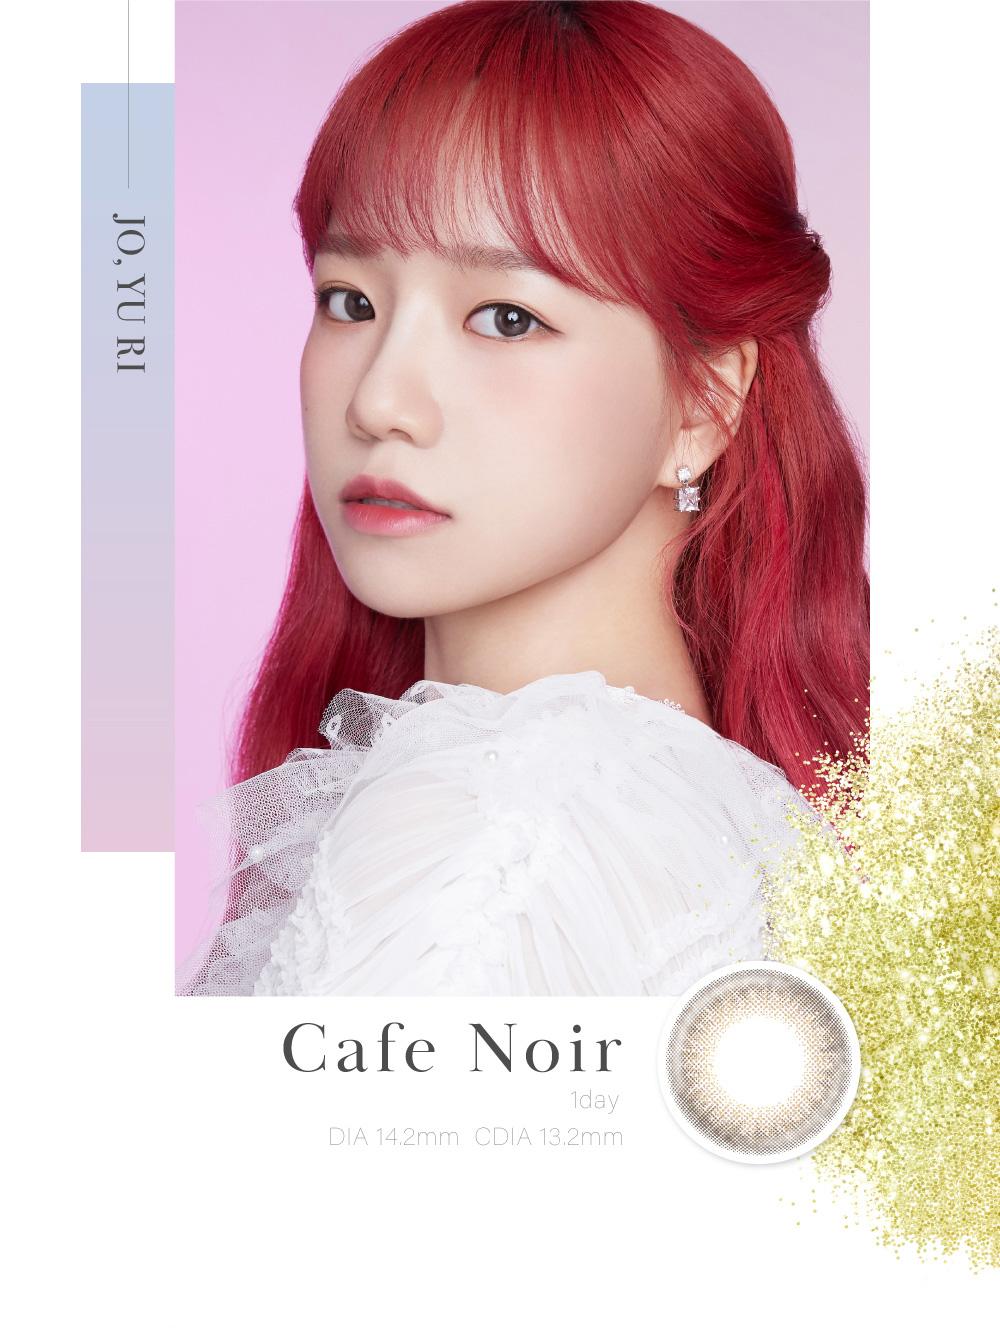 【Cafe Noirカフェノワール】Miche Bloomin' 1Day Iris Grow Series ミッシュブルーミンワンデーアイリスグローシリーズ